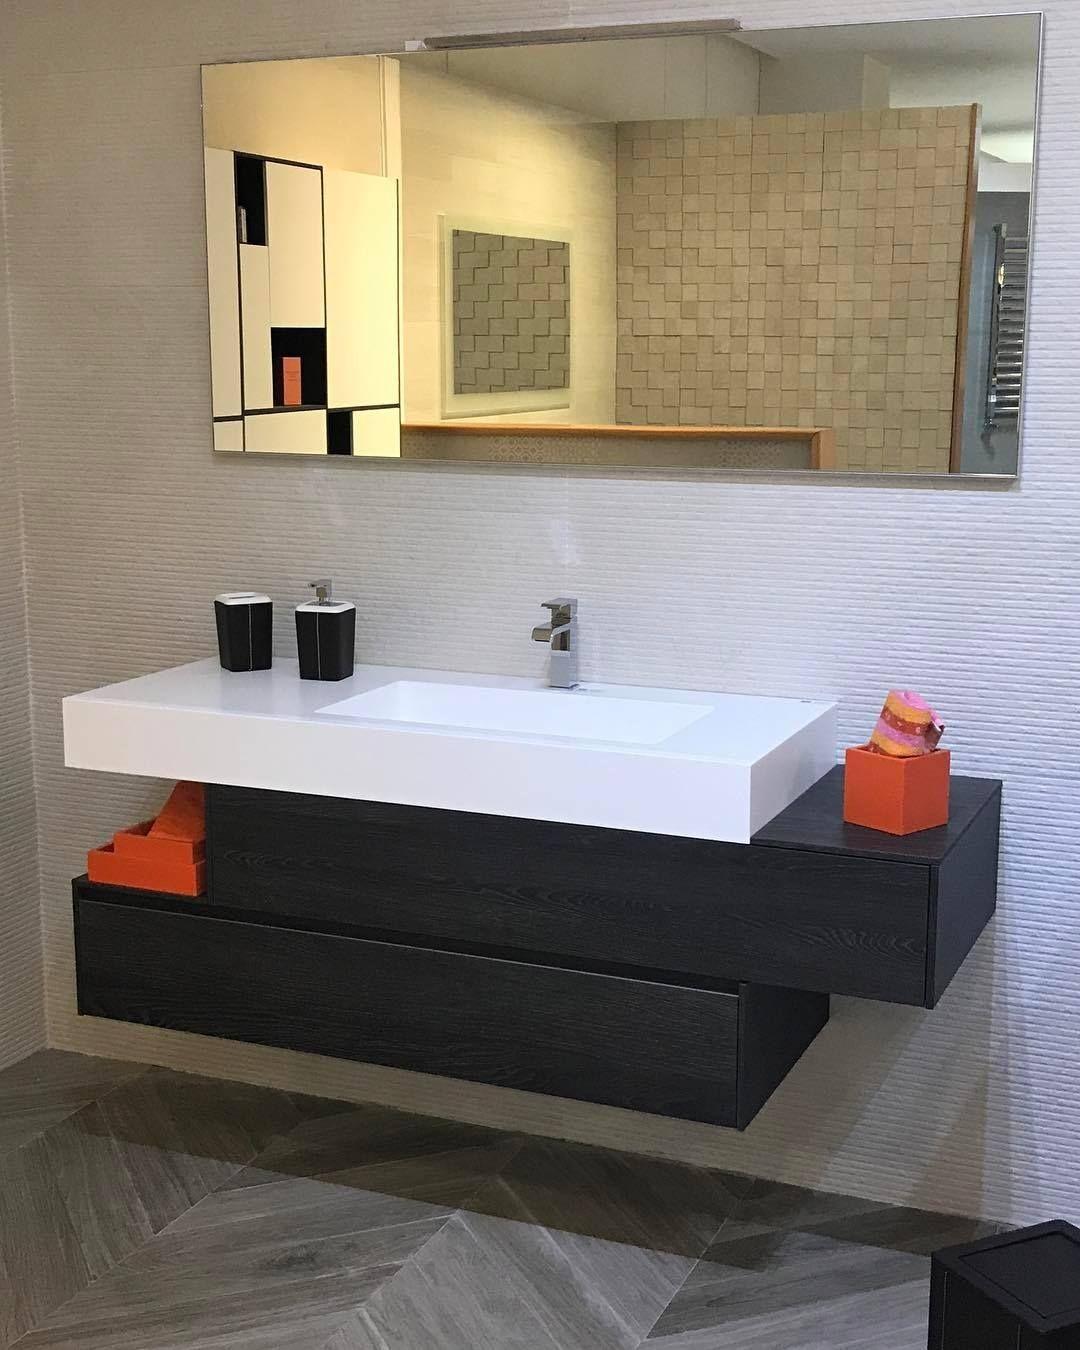 Aqua Mood Mobili Bagno.Nyu Mobili Bagno Eleganti Per Bagni Moderni Ideagroup Bagni Eleganti Bagno Arredamento Bagno